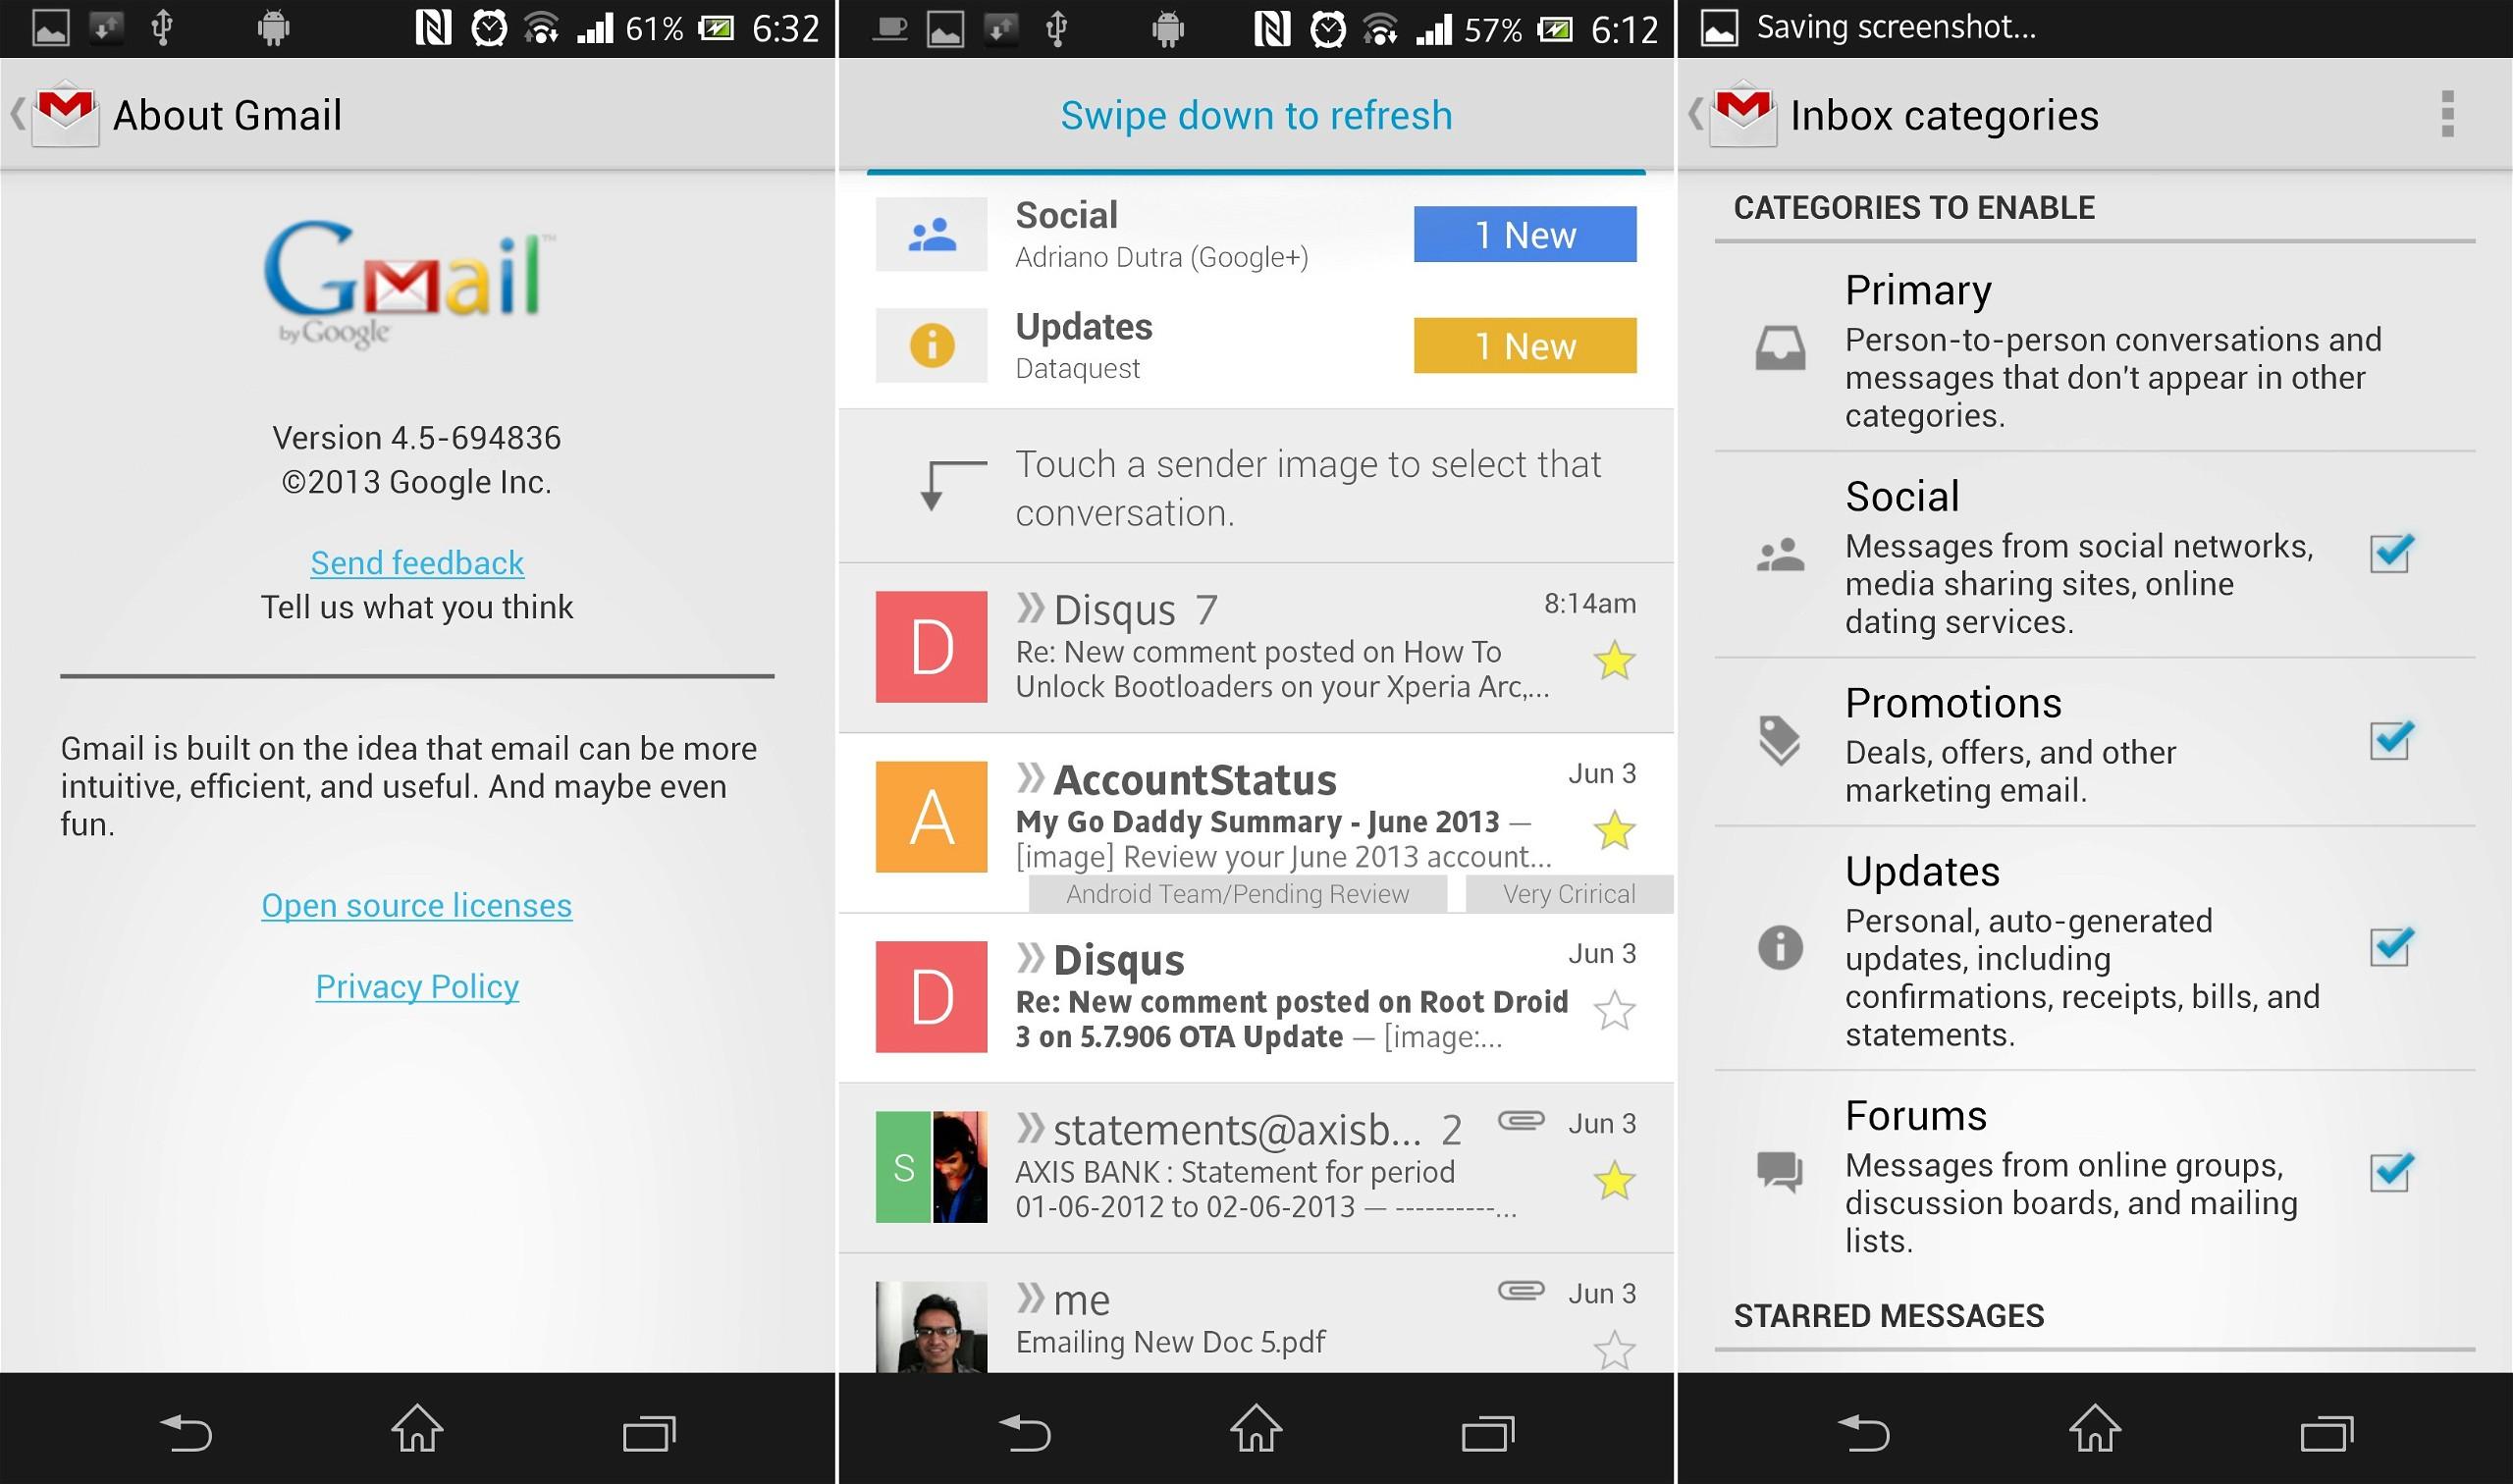 Gmail 4.5 APK